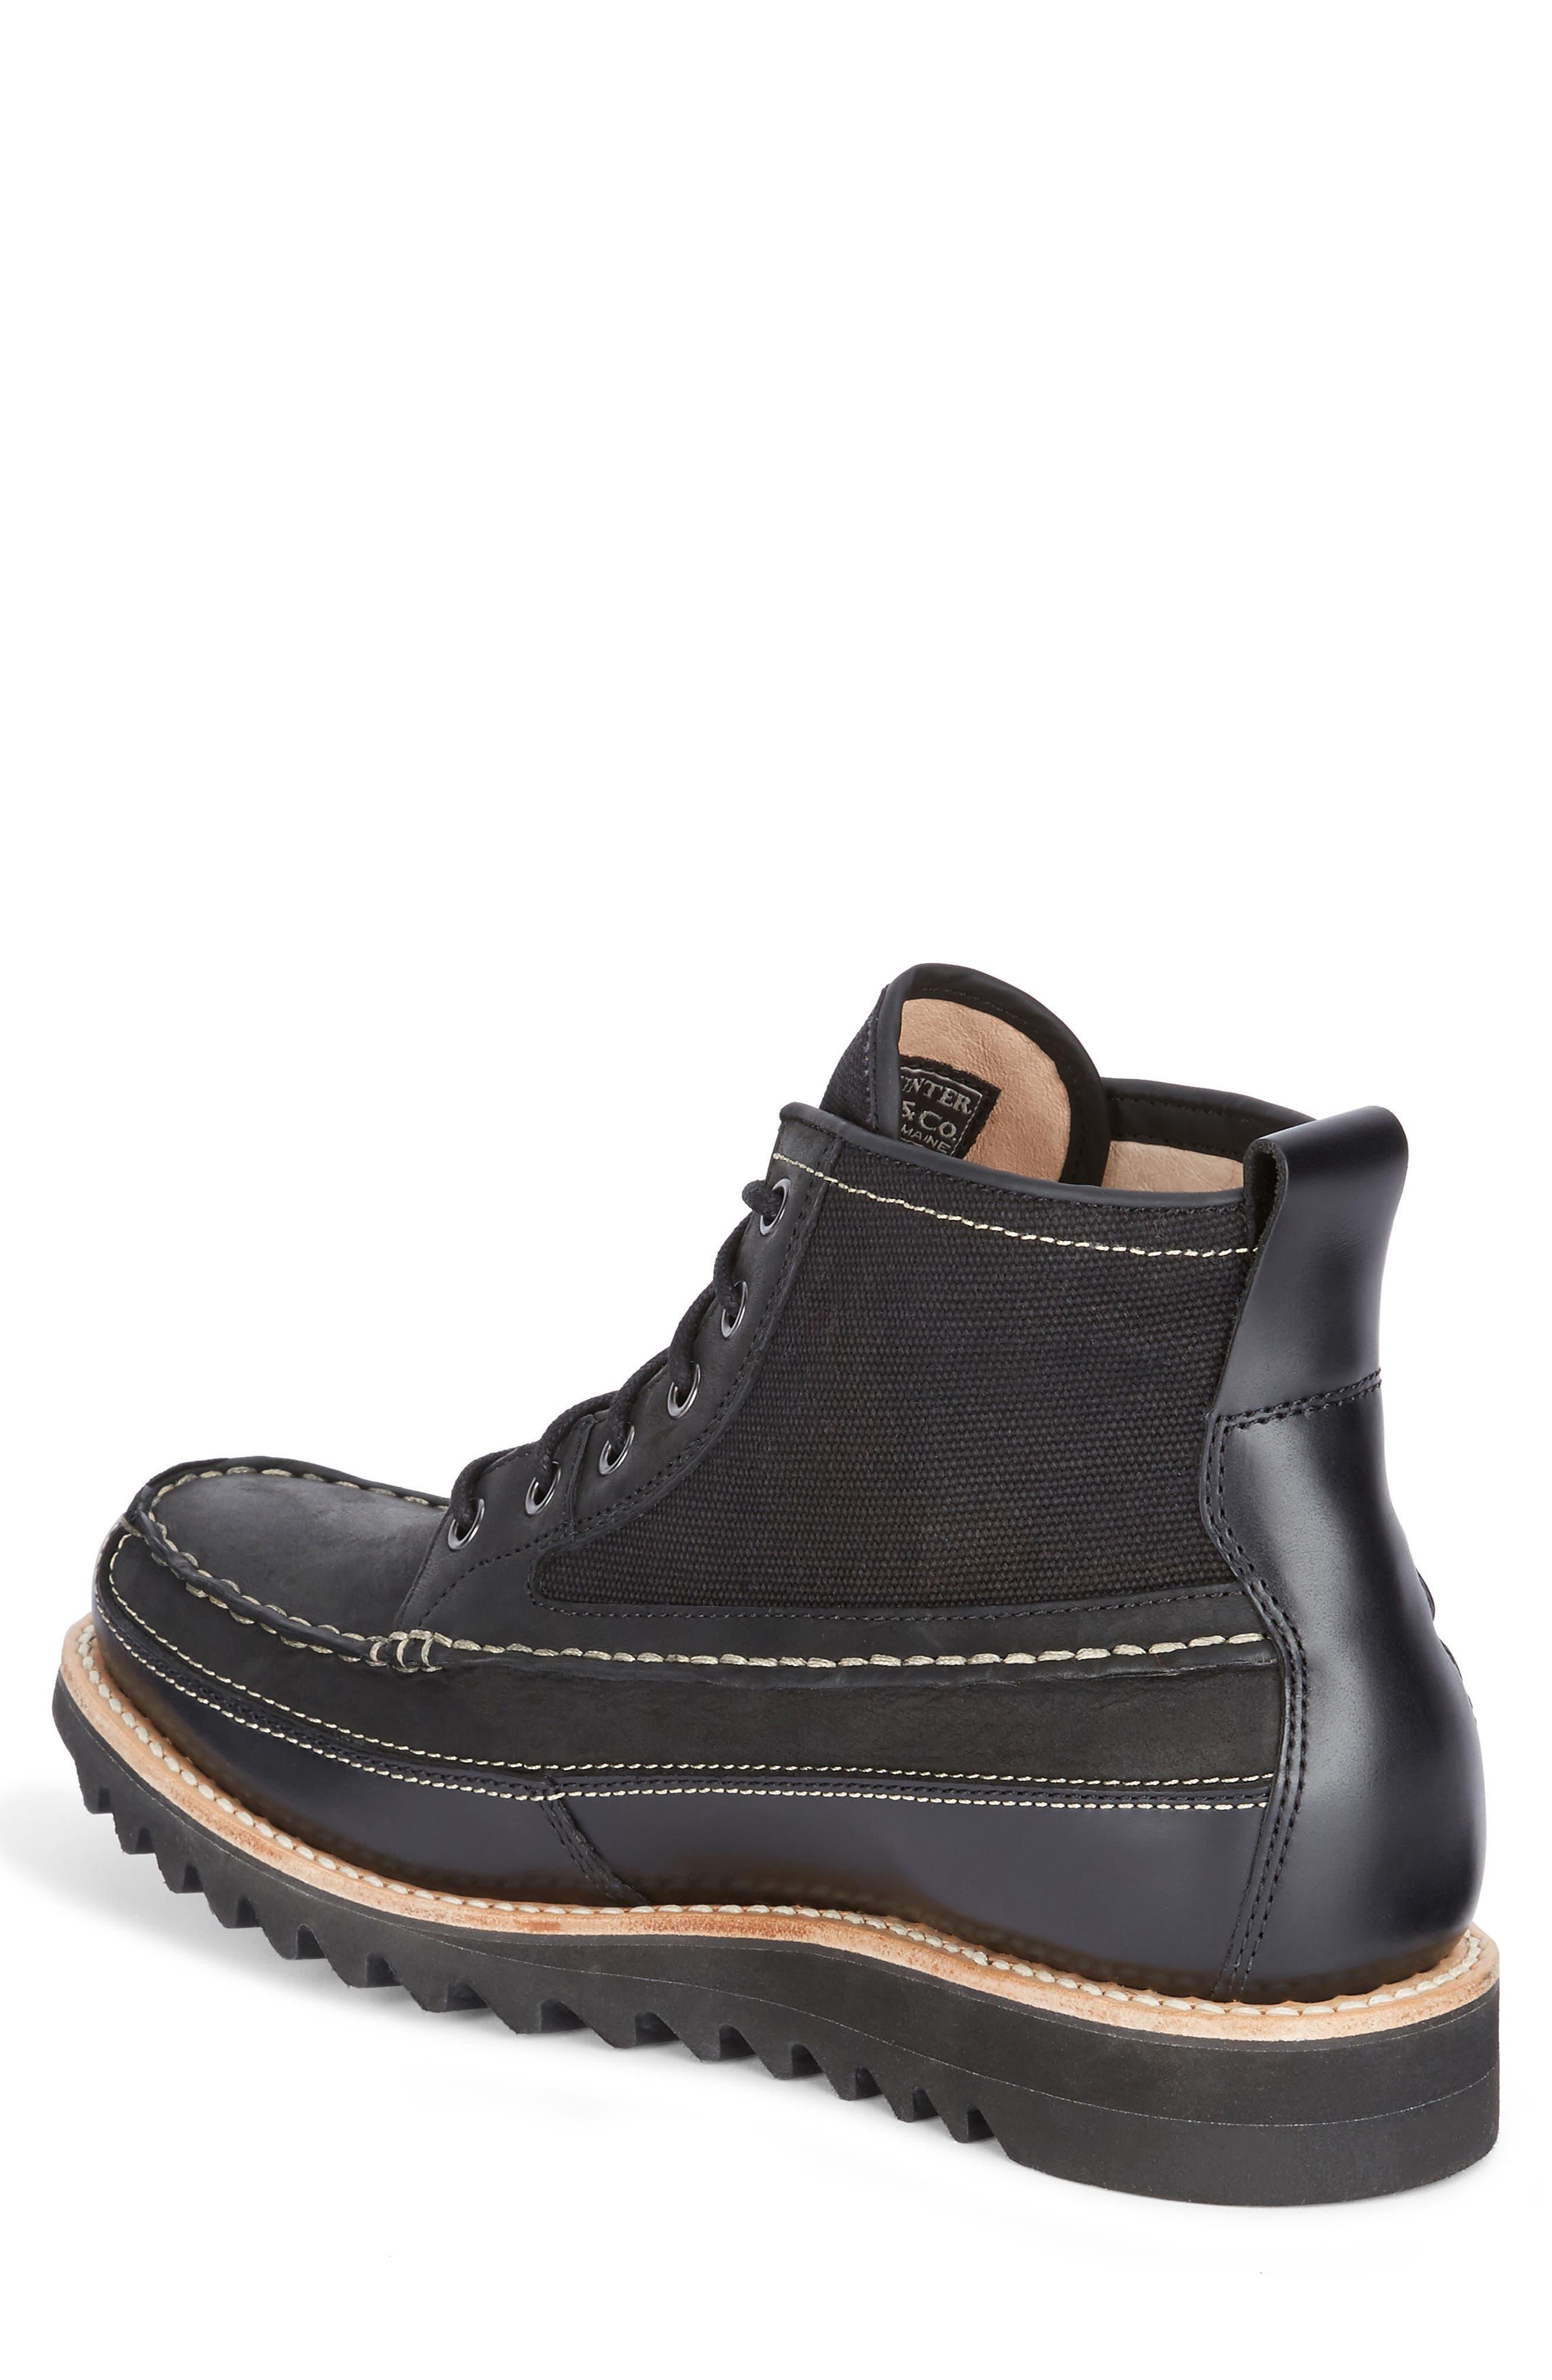 Alternate Image 2  - G.H. Bass & Co. Nickson Razor Moc Toe Boot (Men)